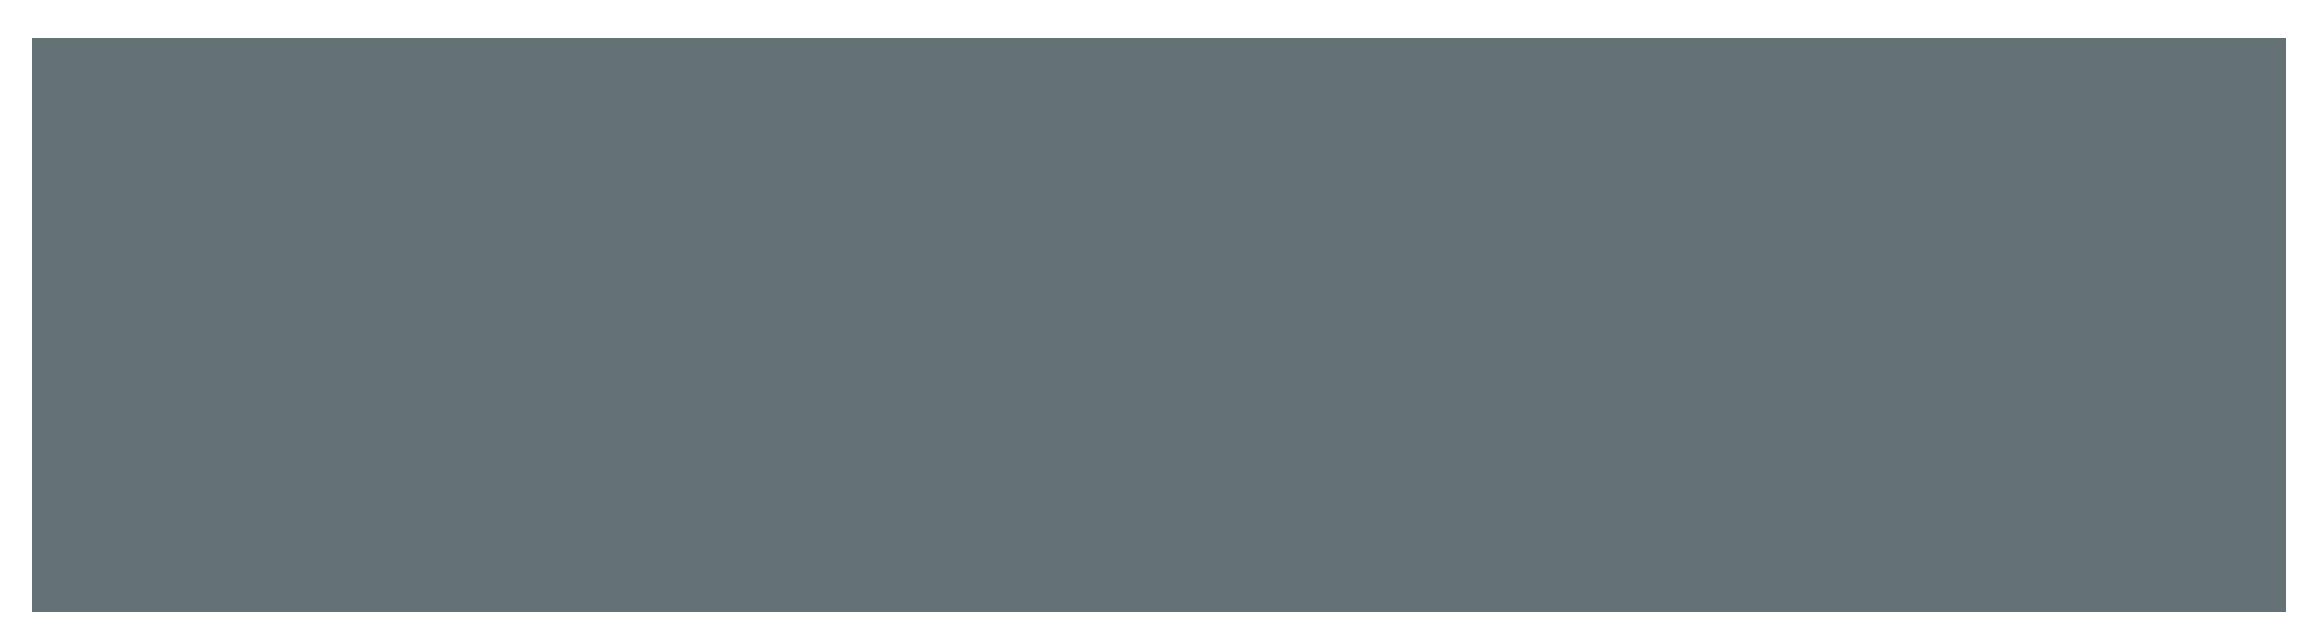 Peter_Michalski_Logo_Farbe_1